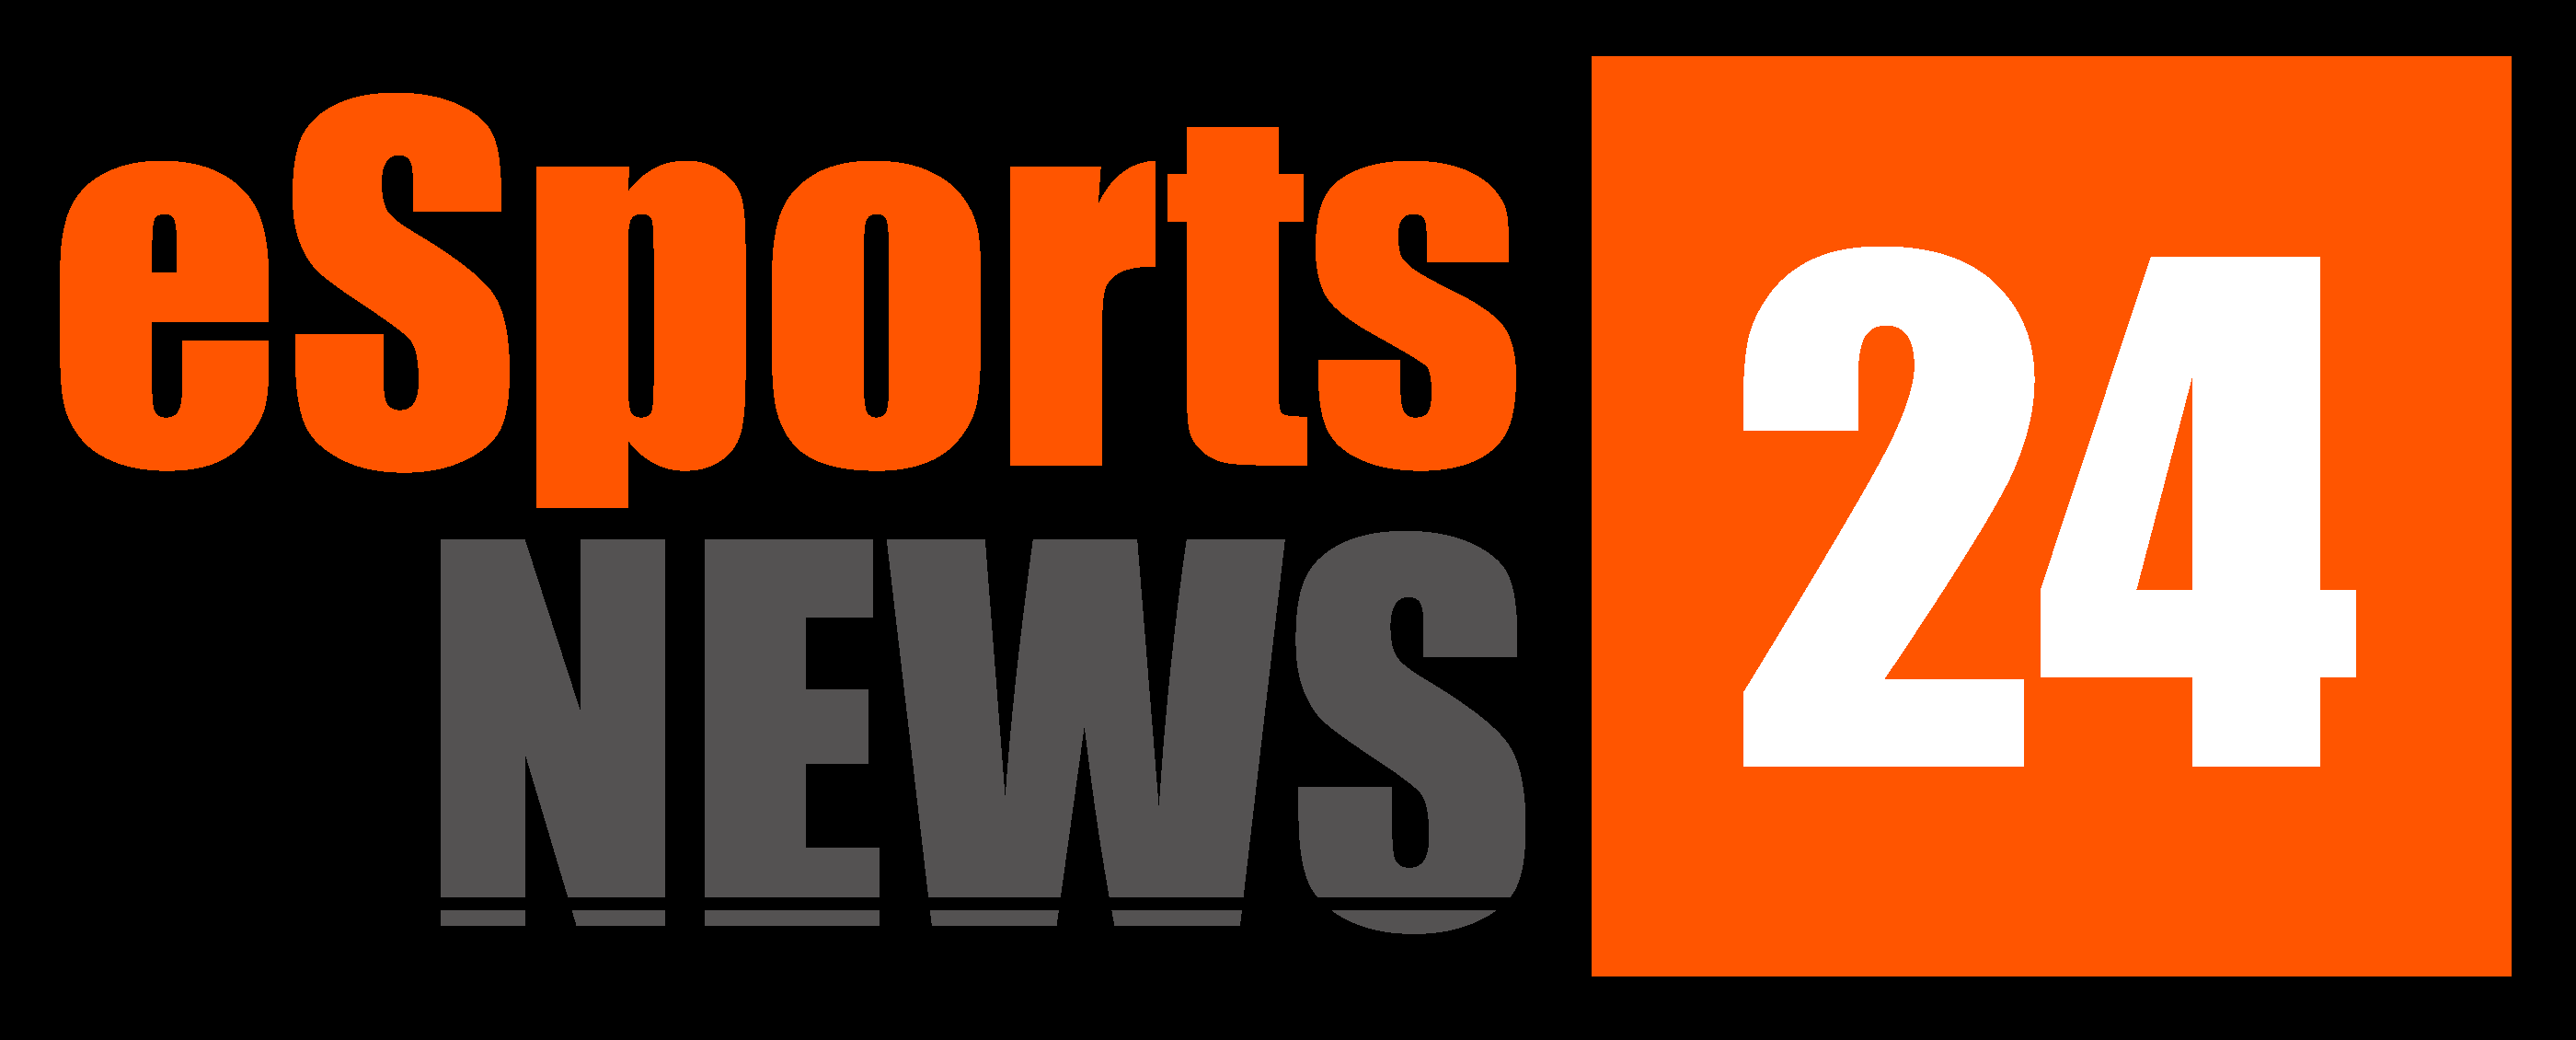 eSports News 24